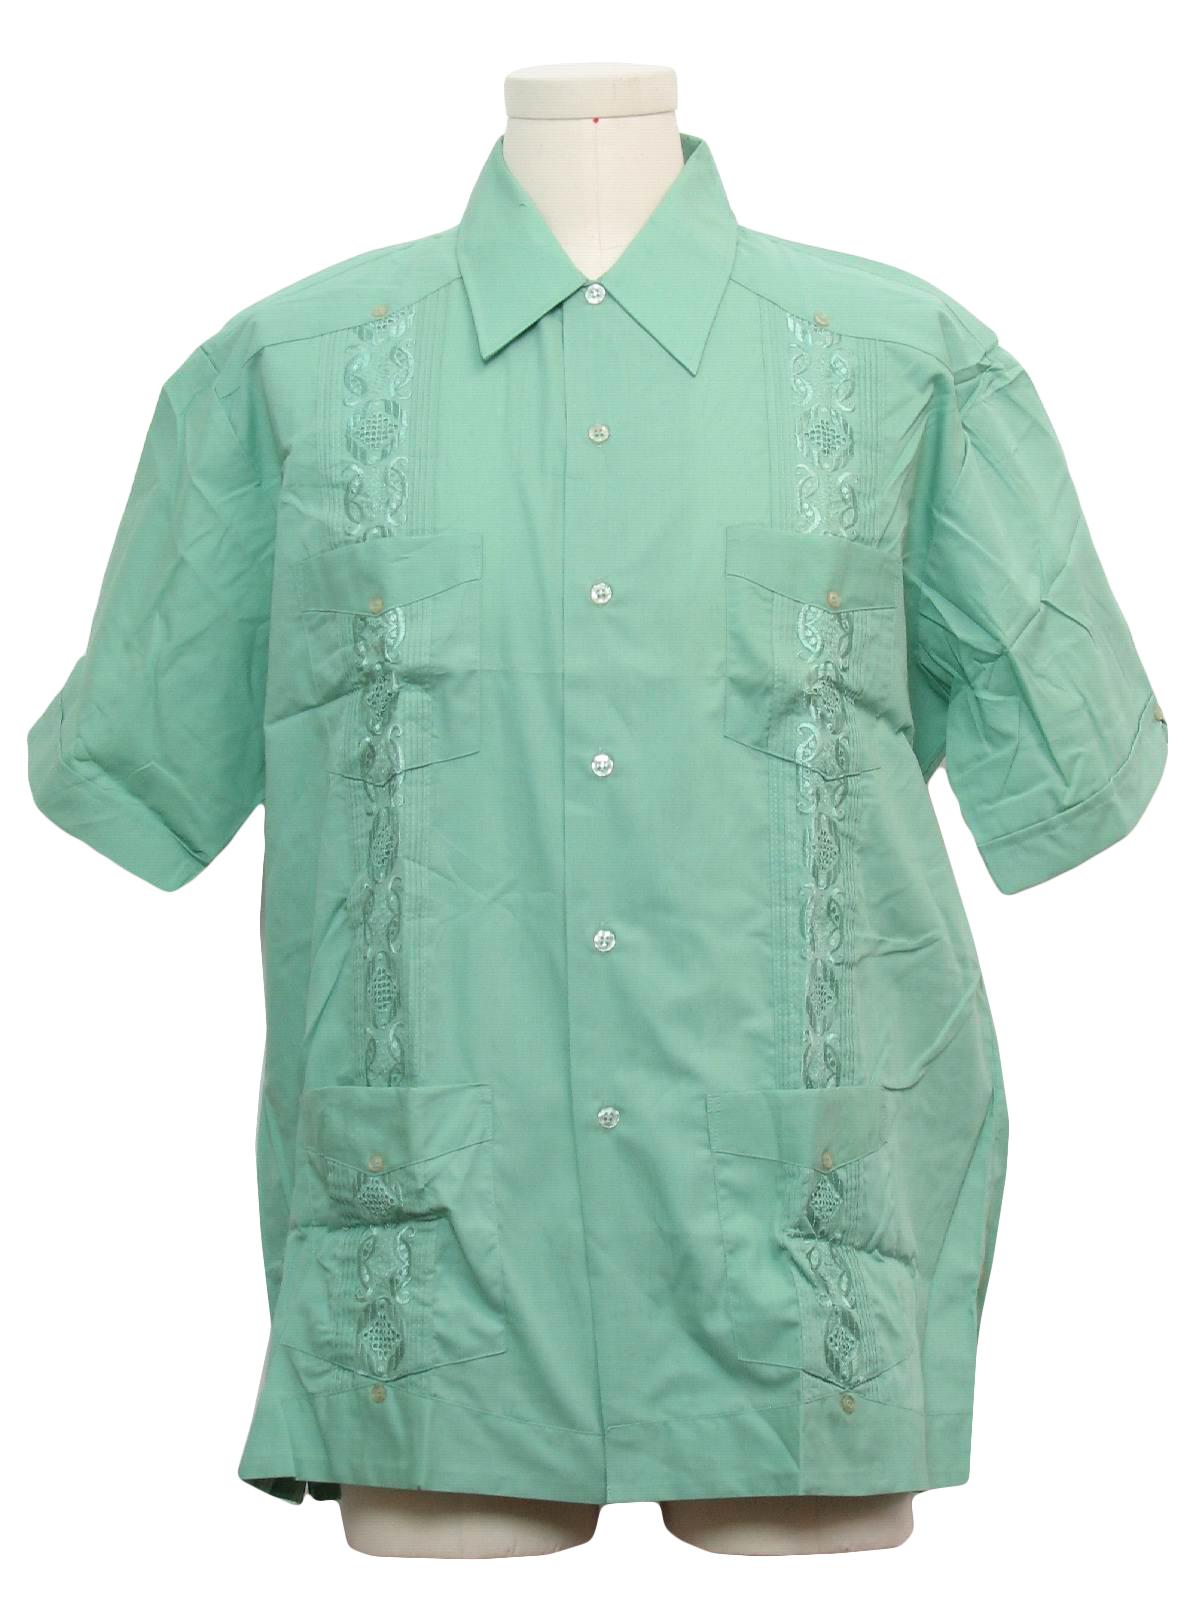 Retro 1980's Guayabera Shirt (Haband) : 80s -Haband- Mens ...